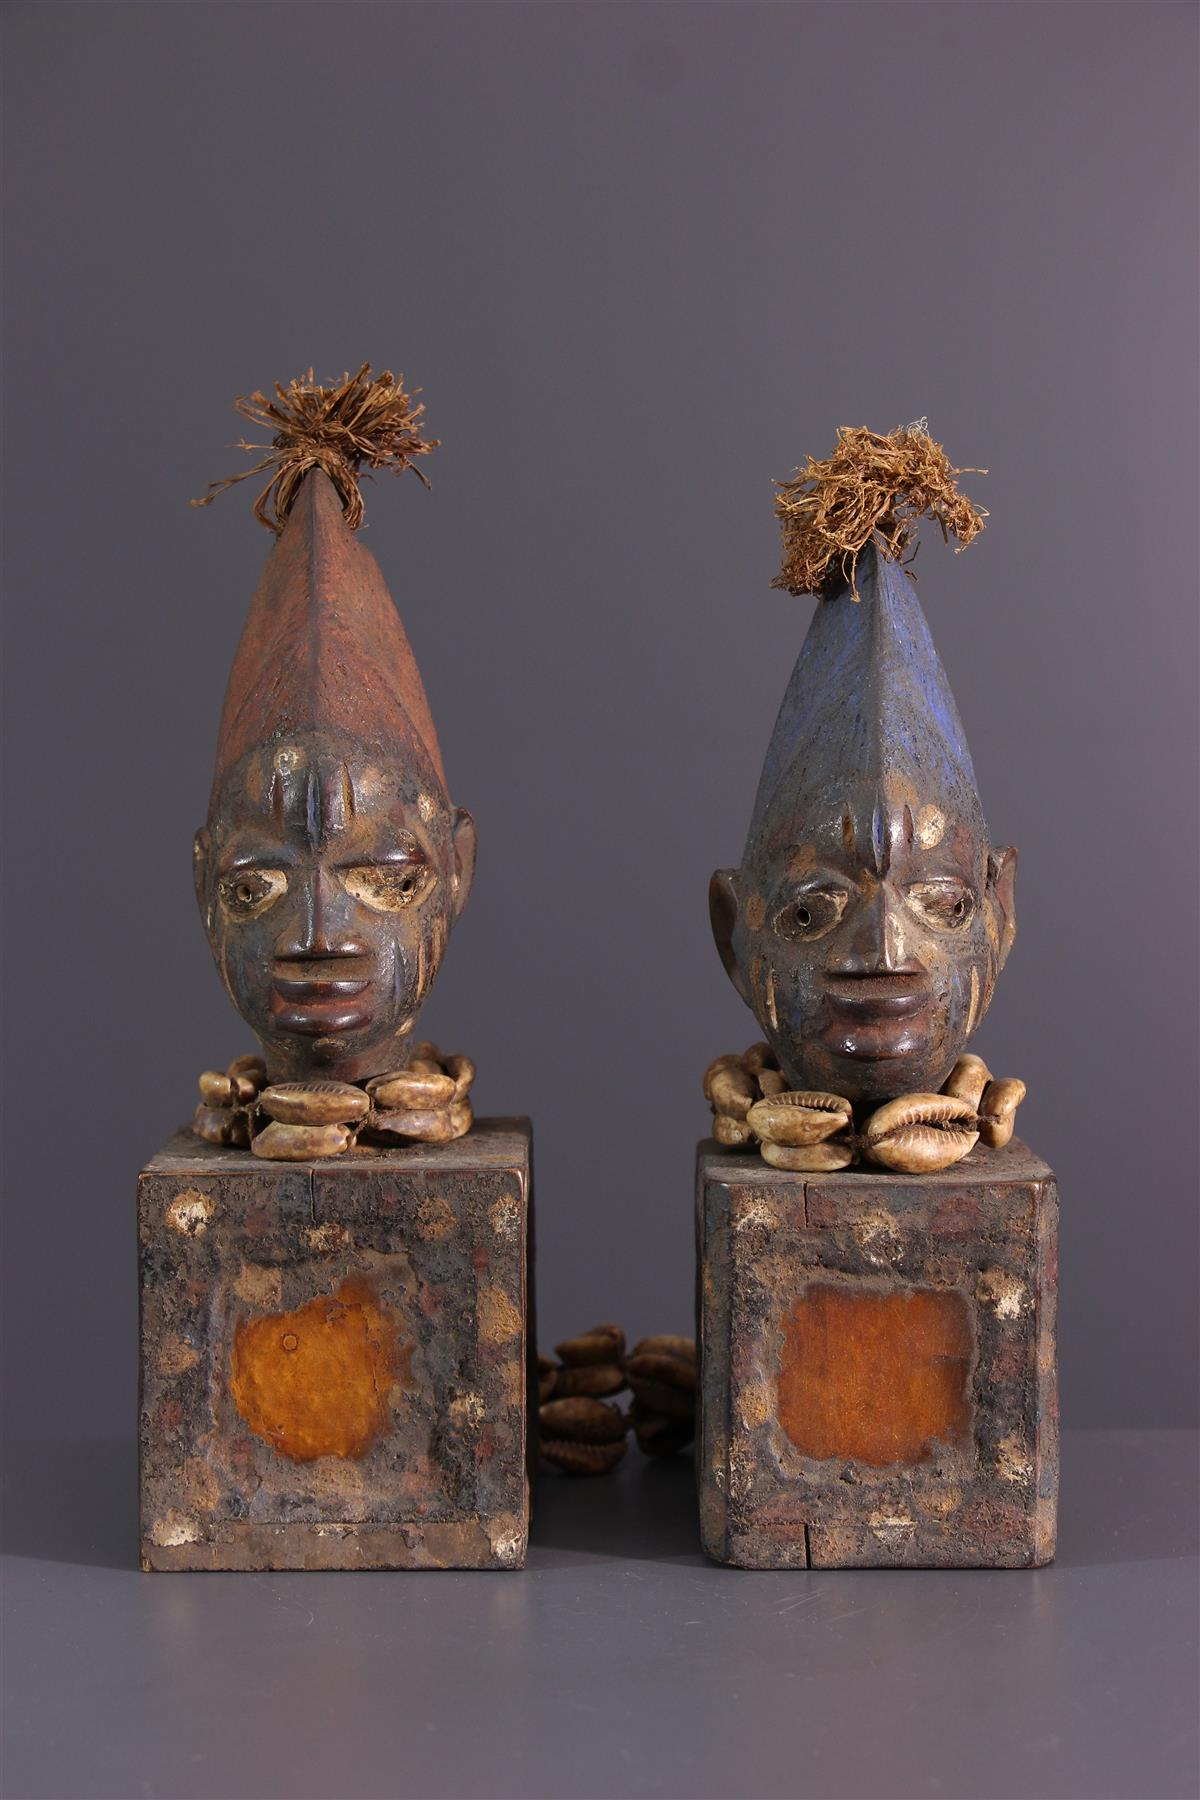 Yoruba figures - African art